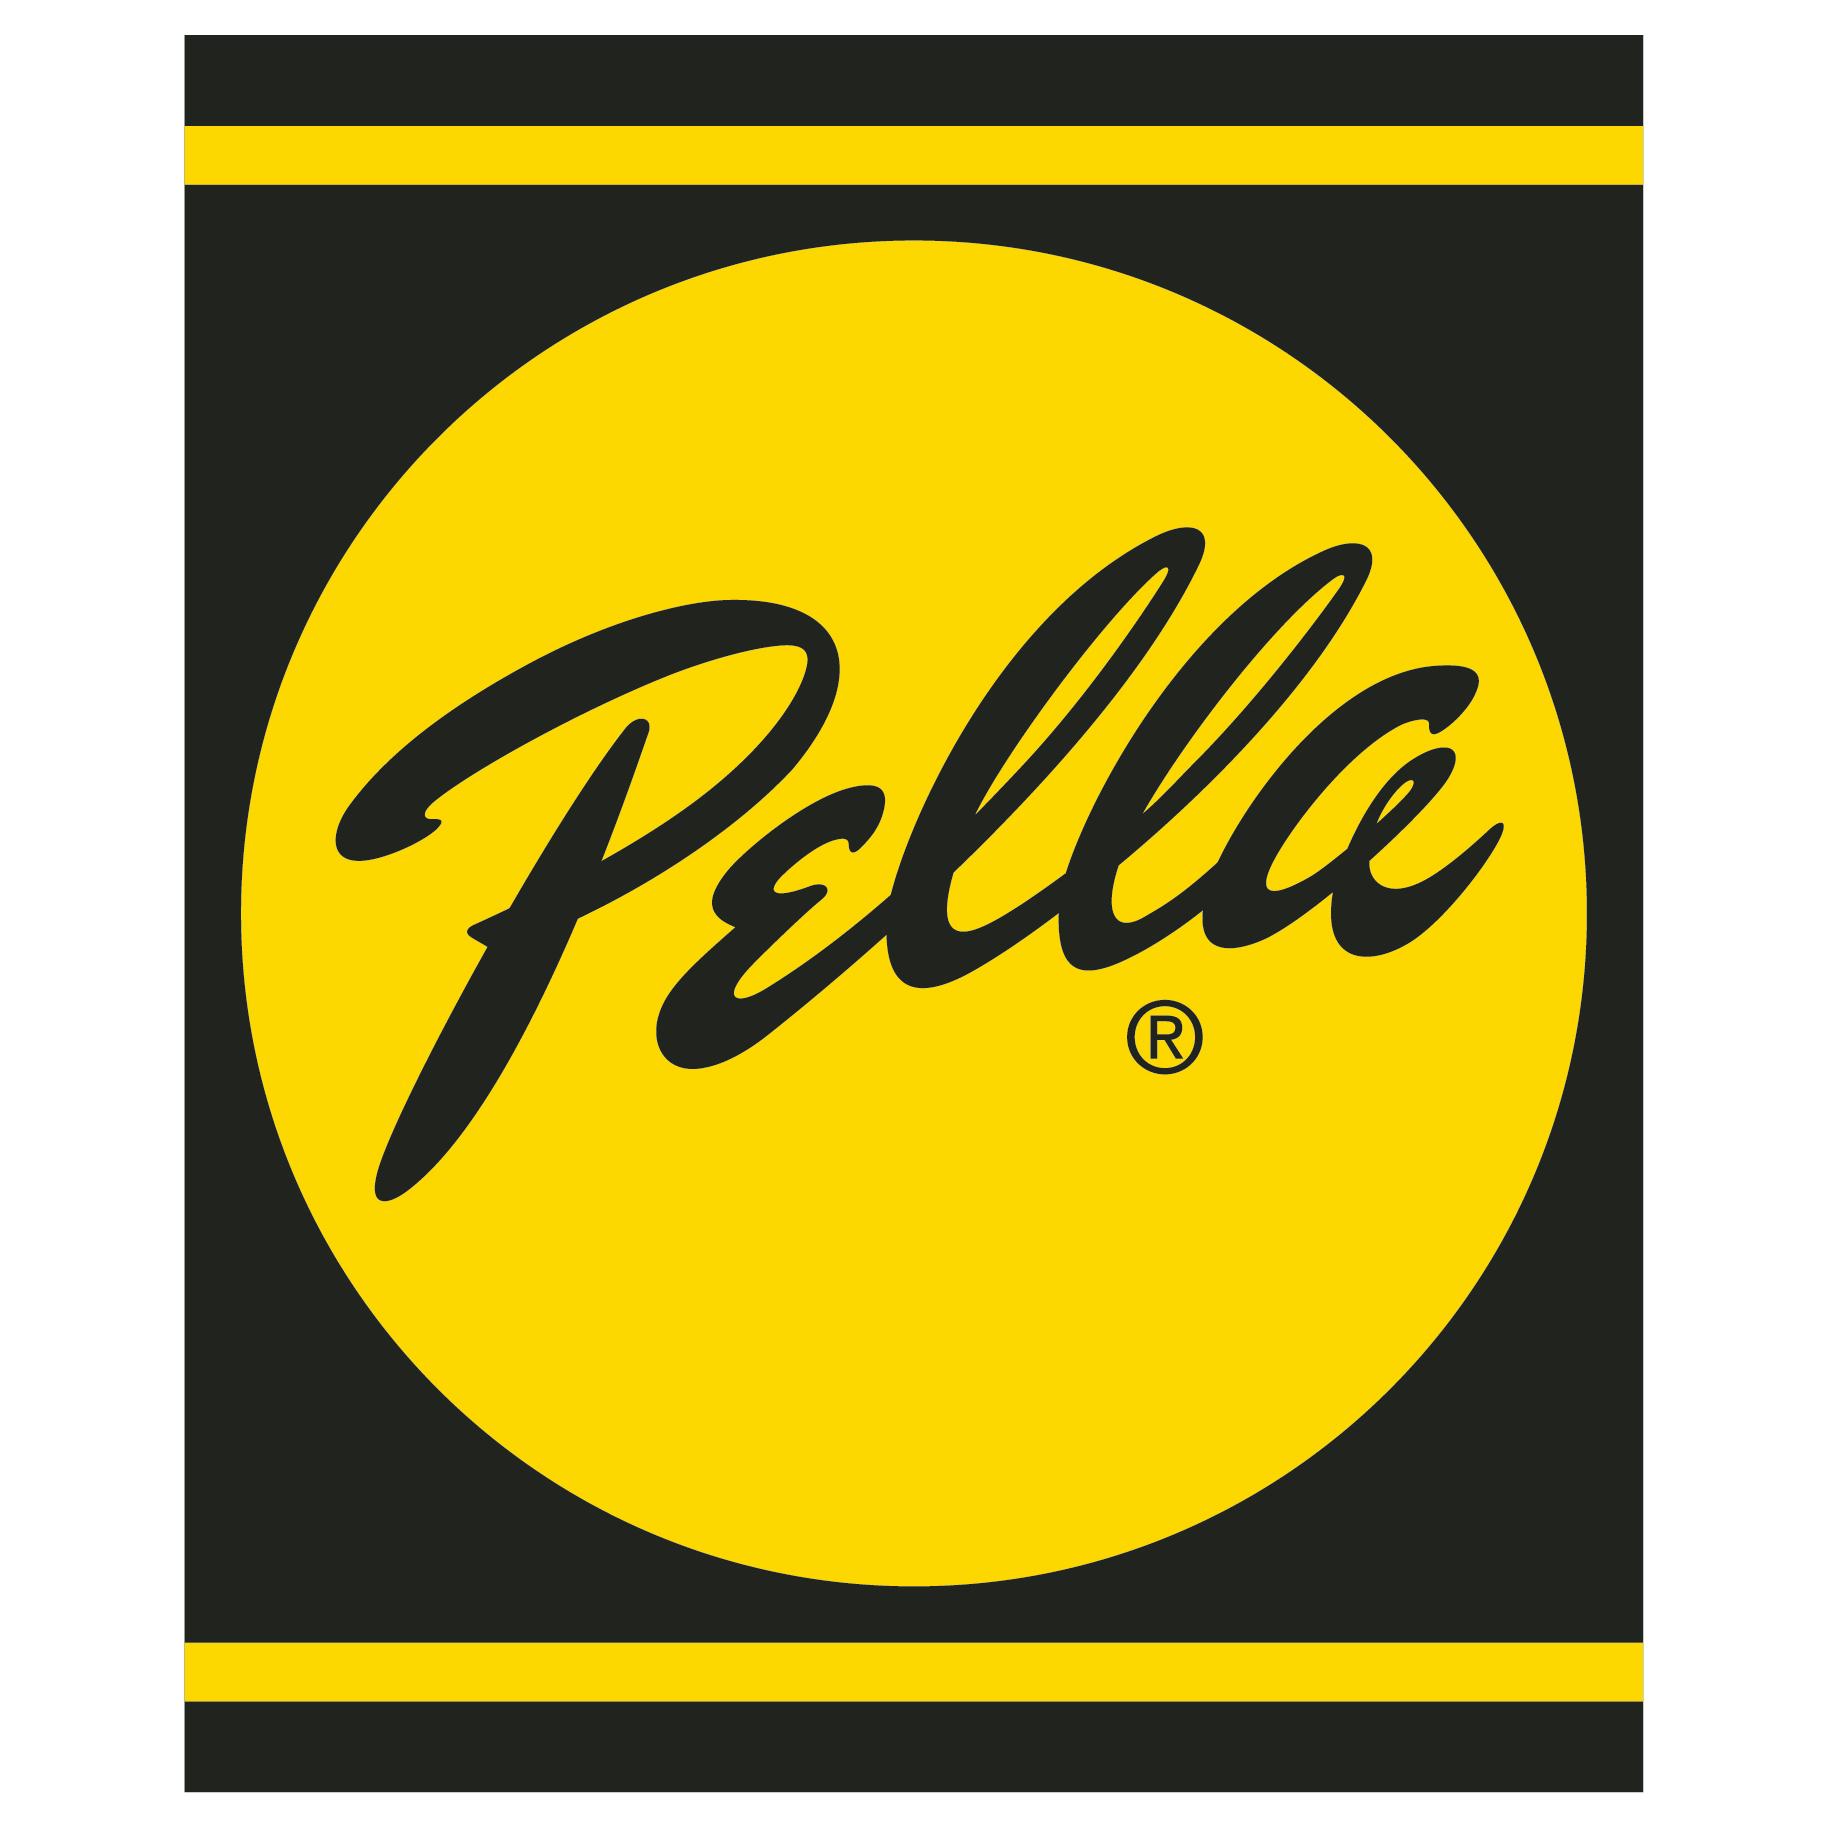 Pella Windows and Doors image 6